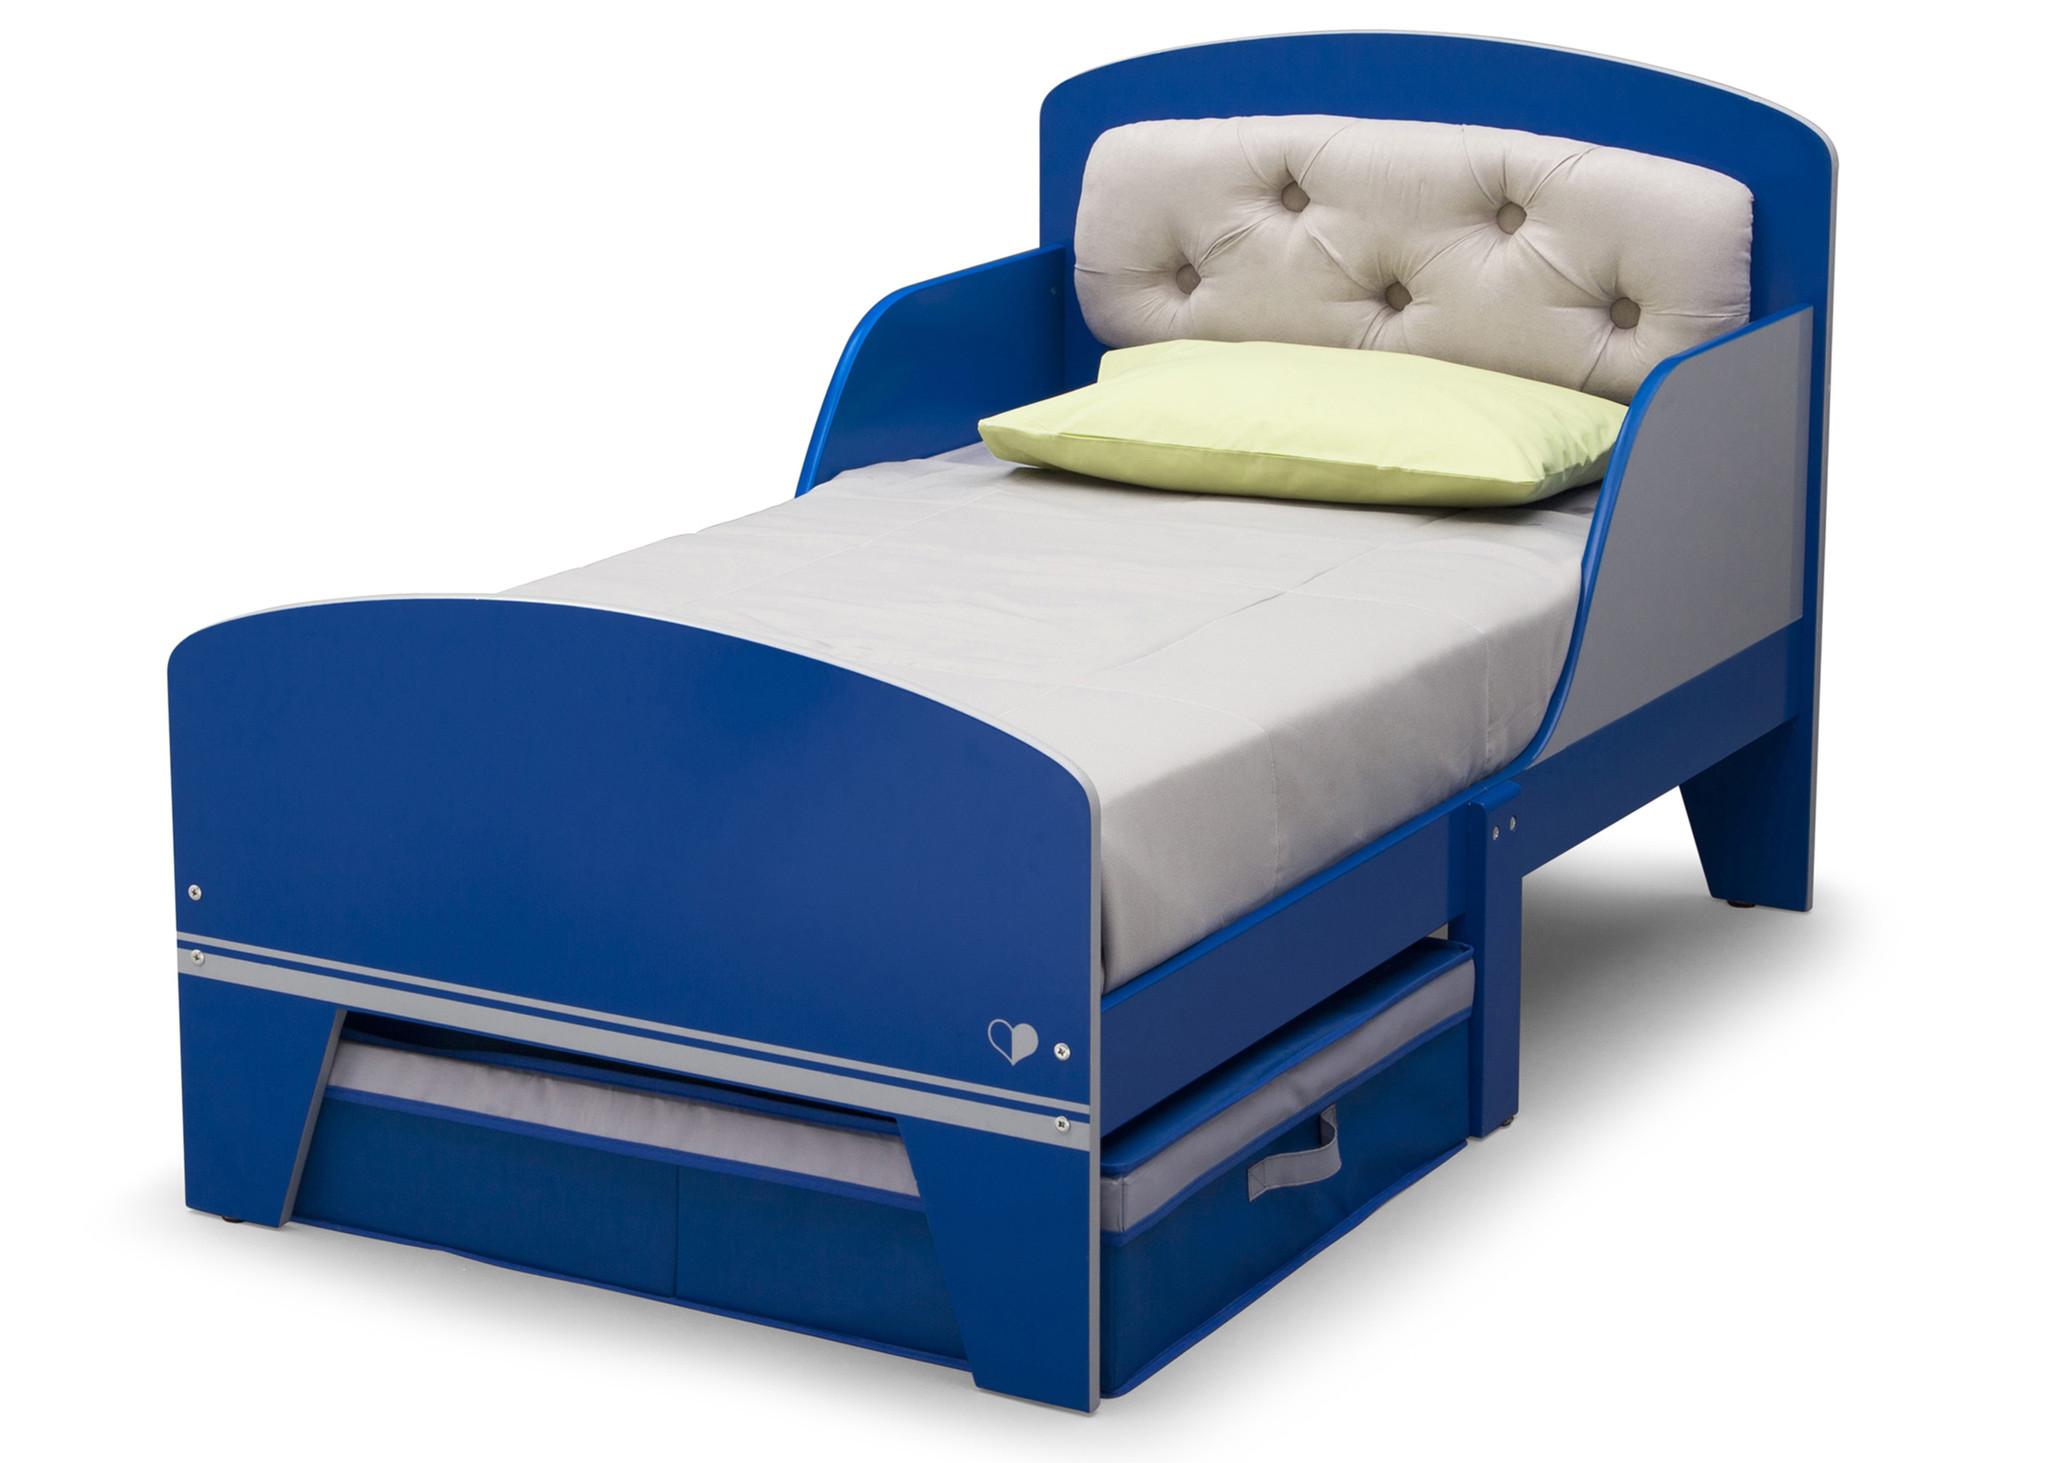 Toddler Bed Upholstered Headboard